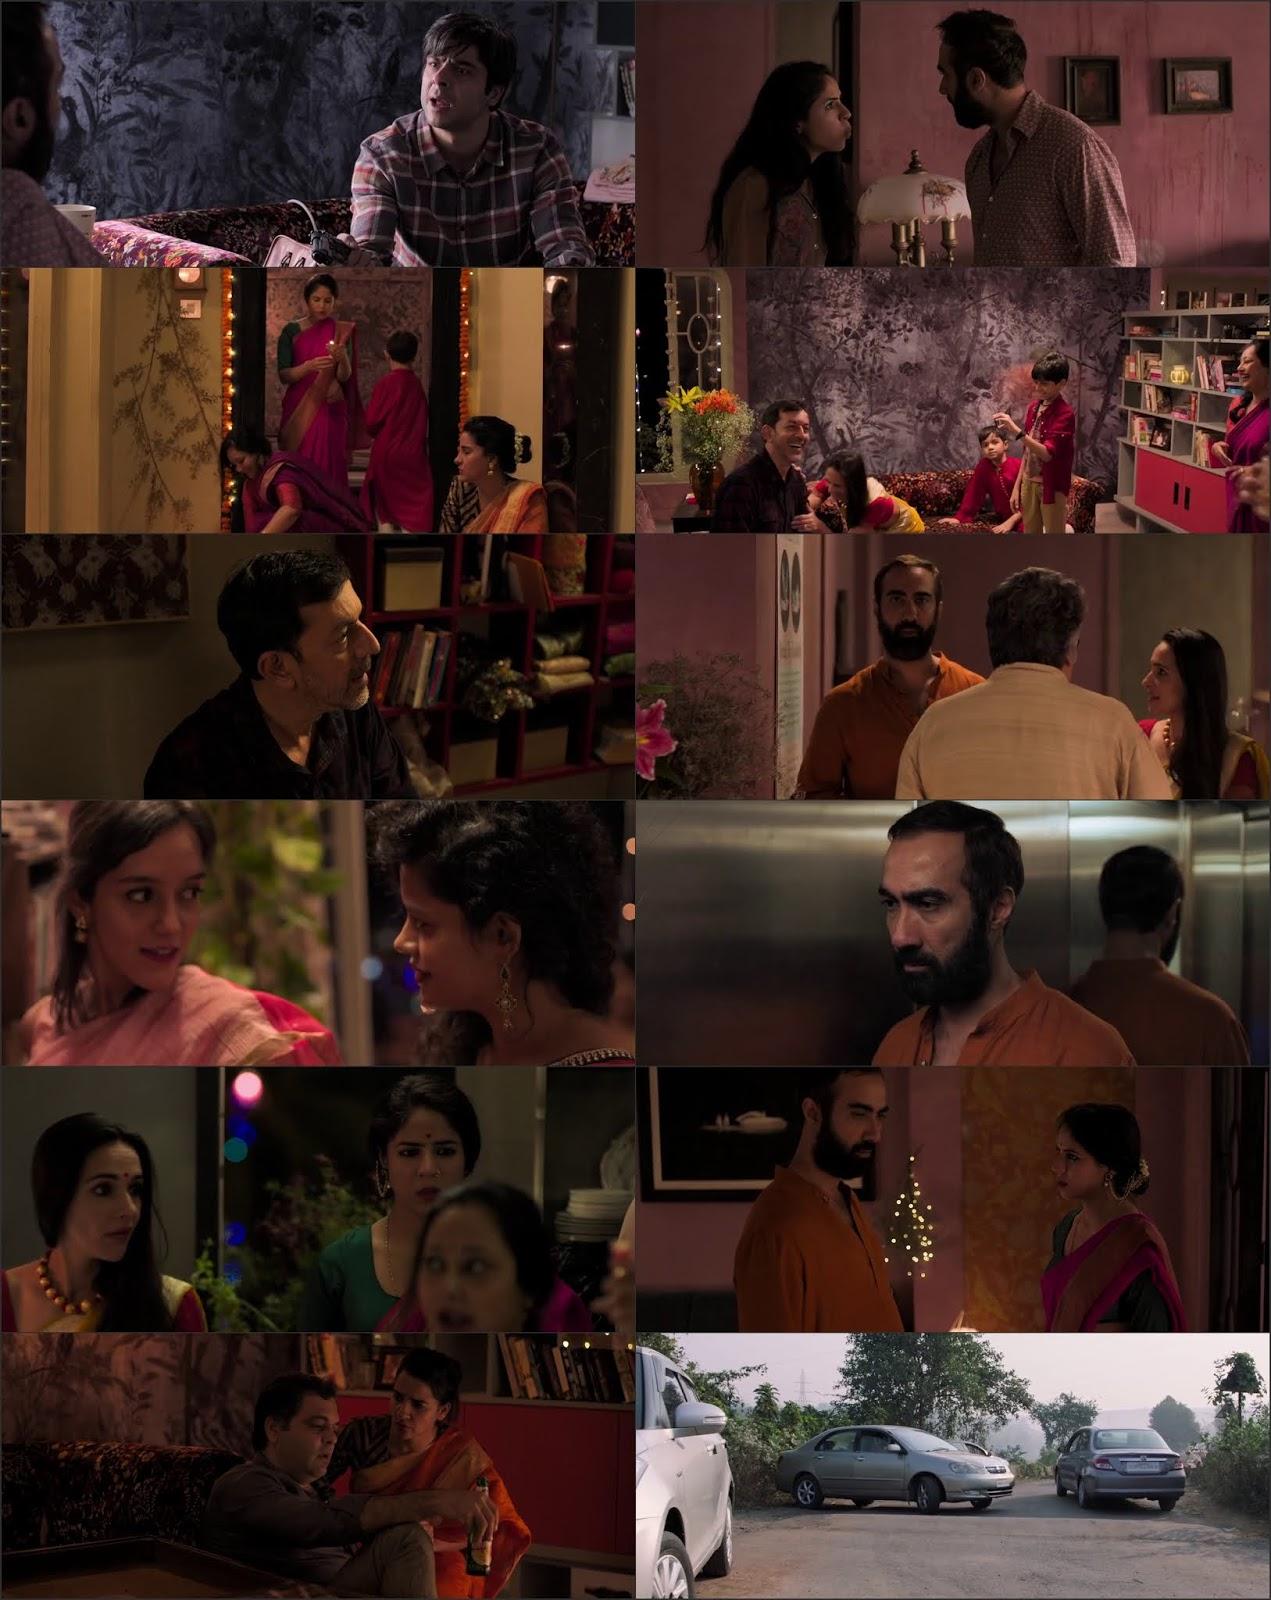 Kadakh 2020 HDRip 900Mb Hindi Movie Download 720p